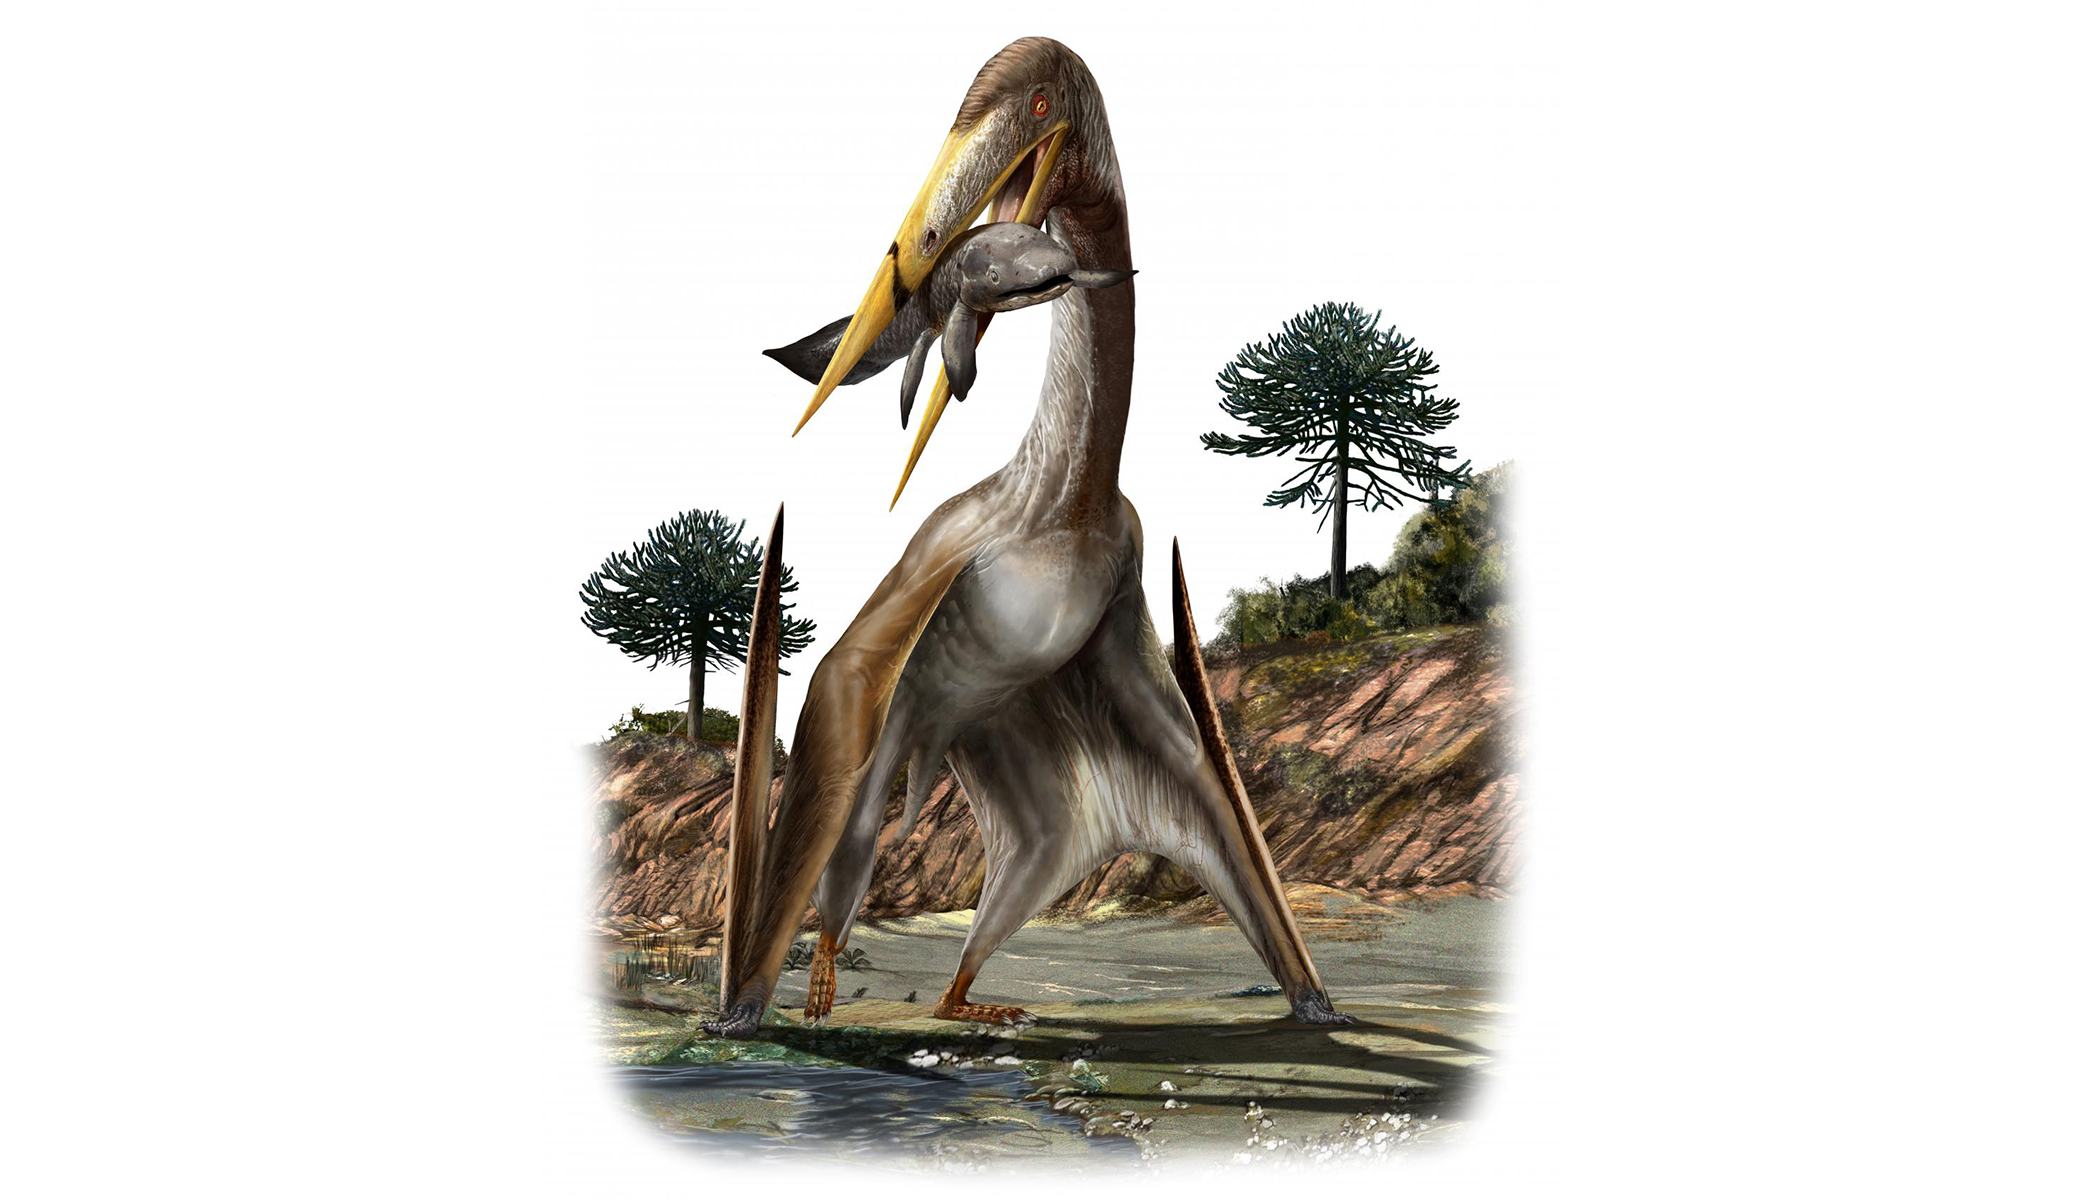 An illustration of a giant pterosaur